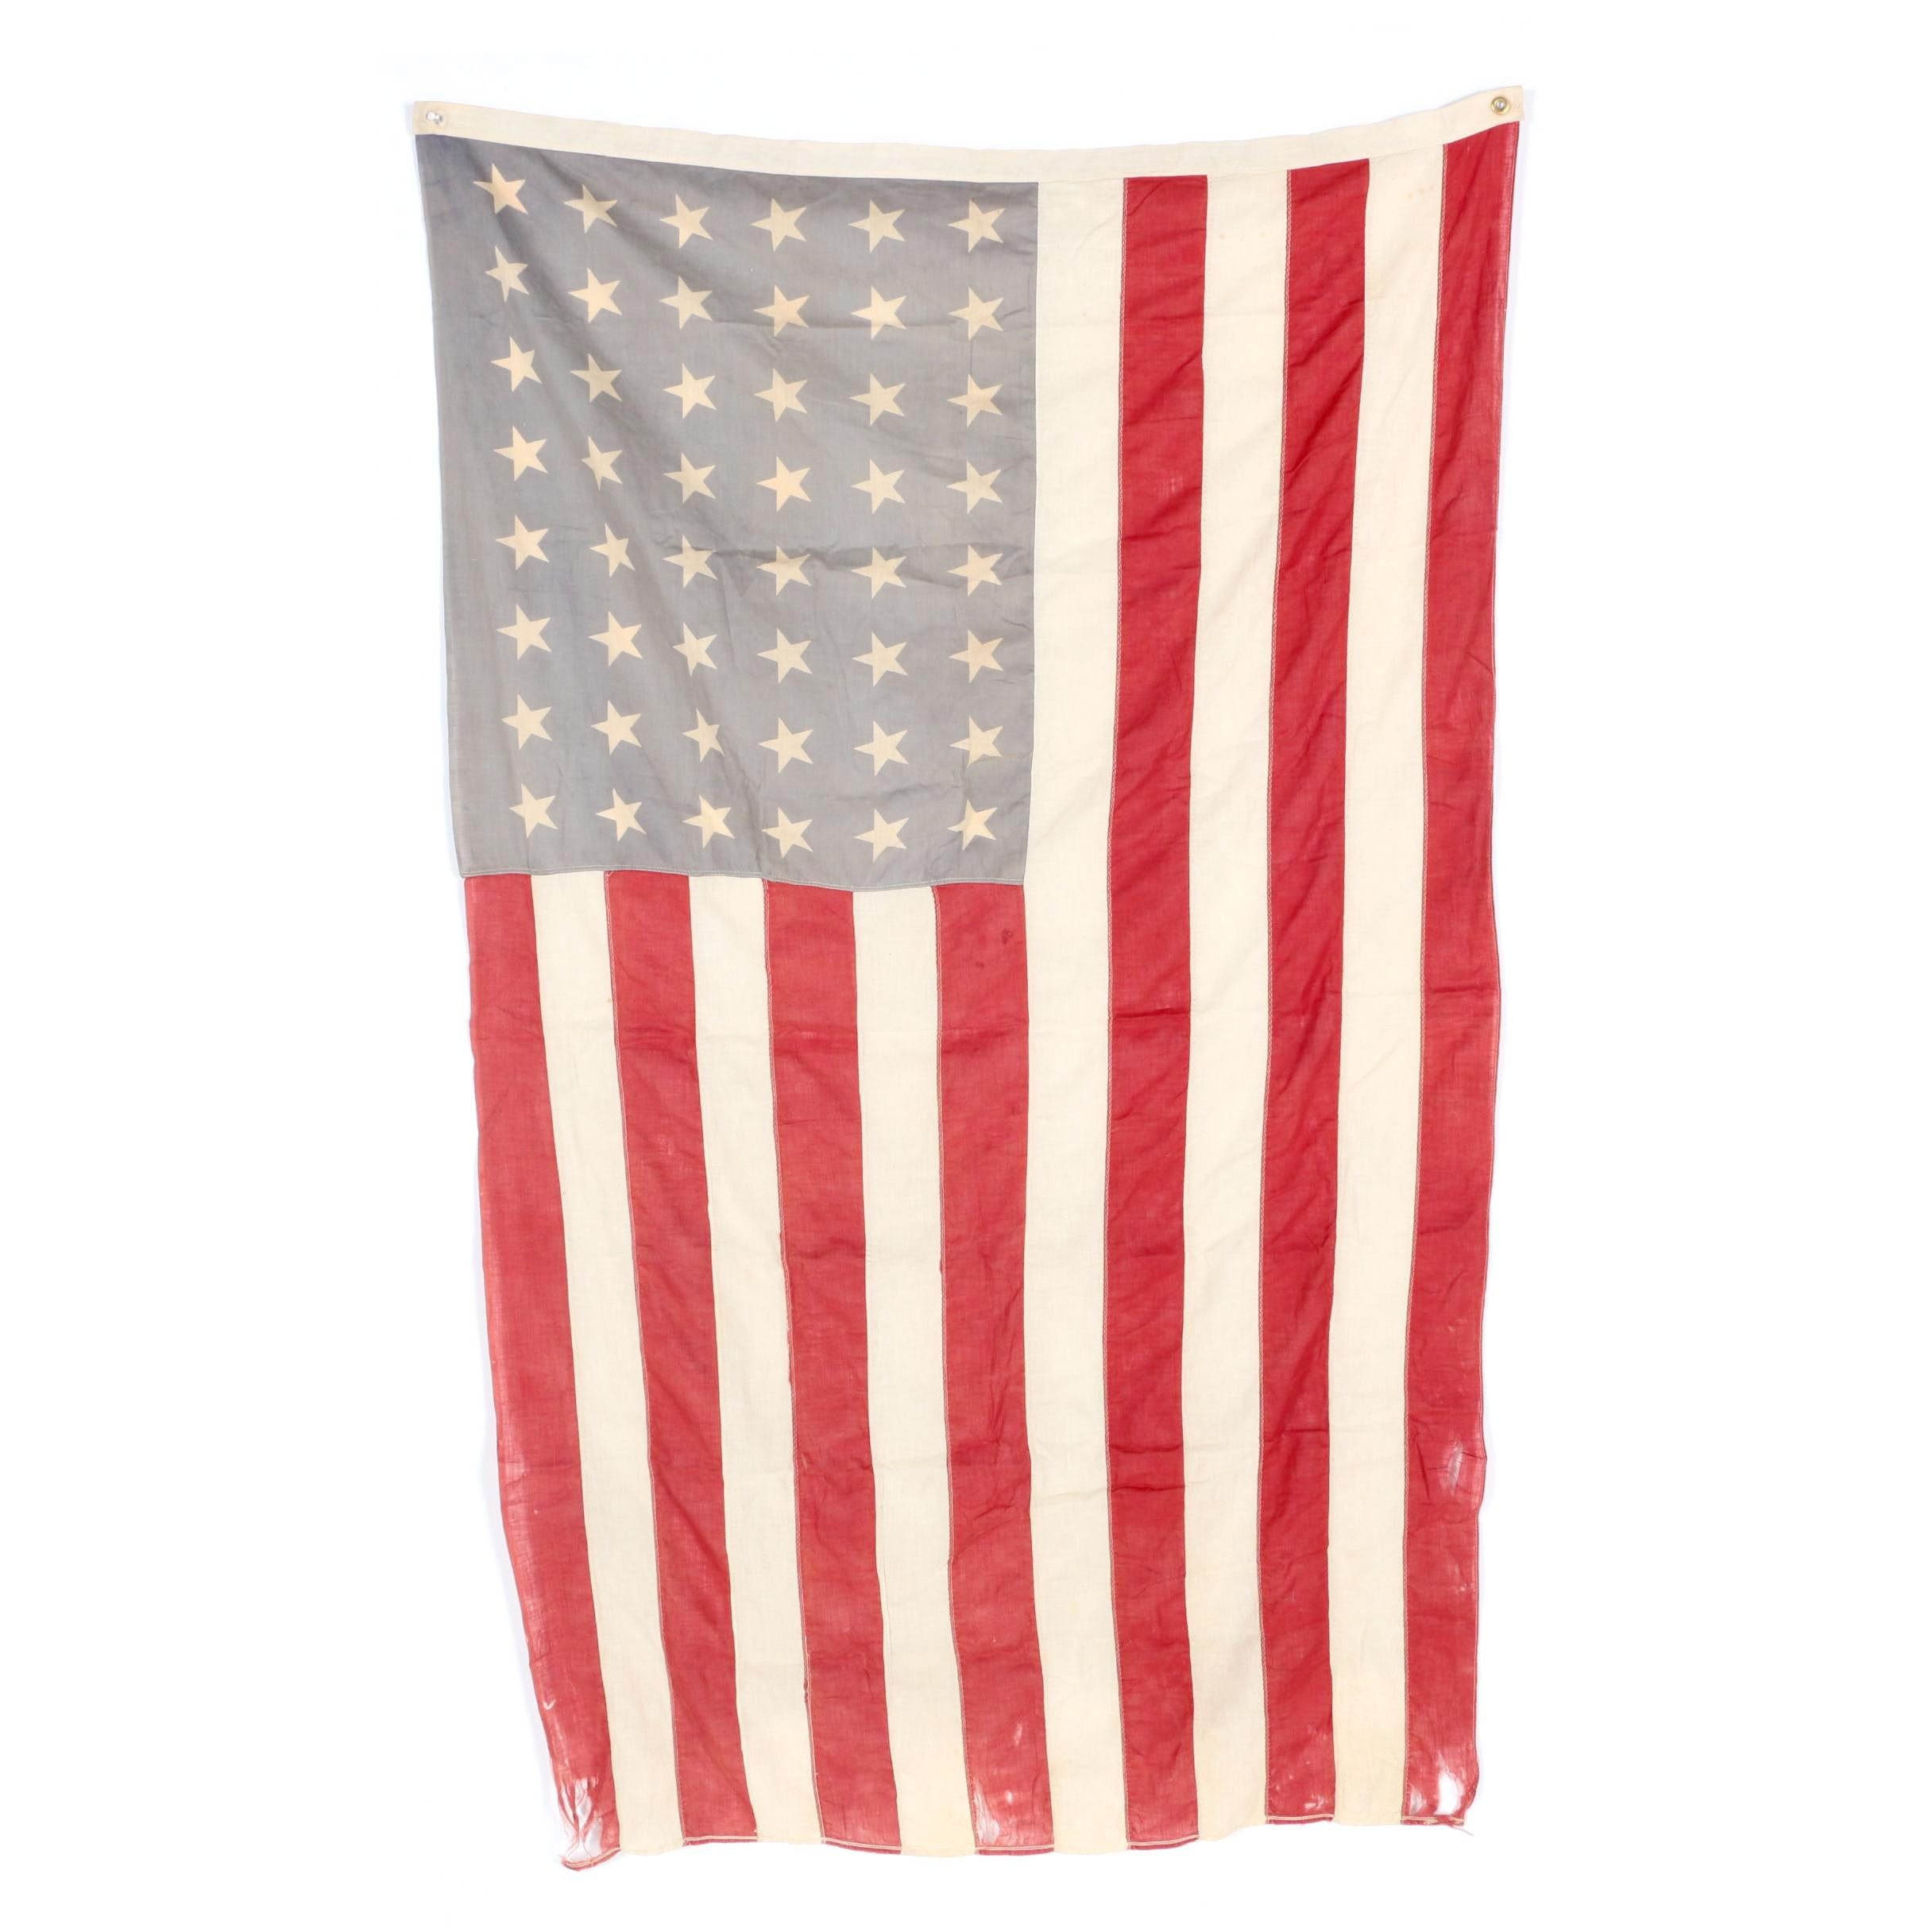 Vintage 48 Star American Flag